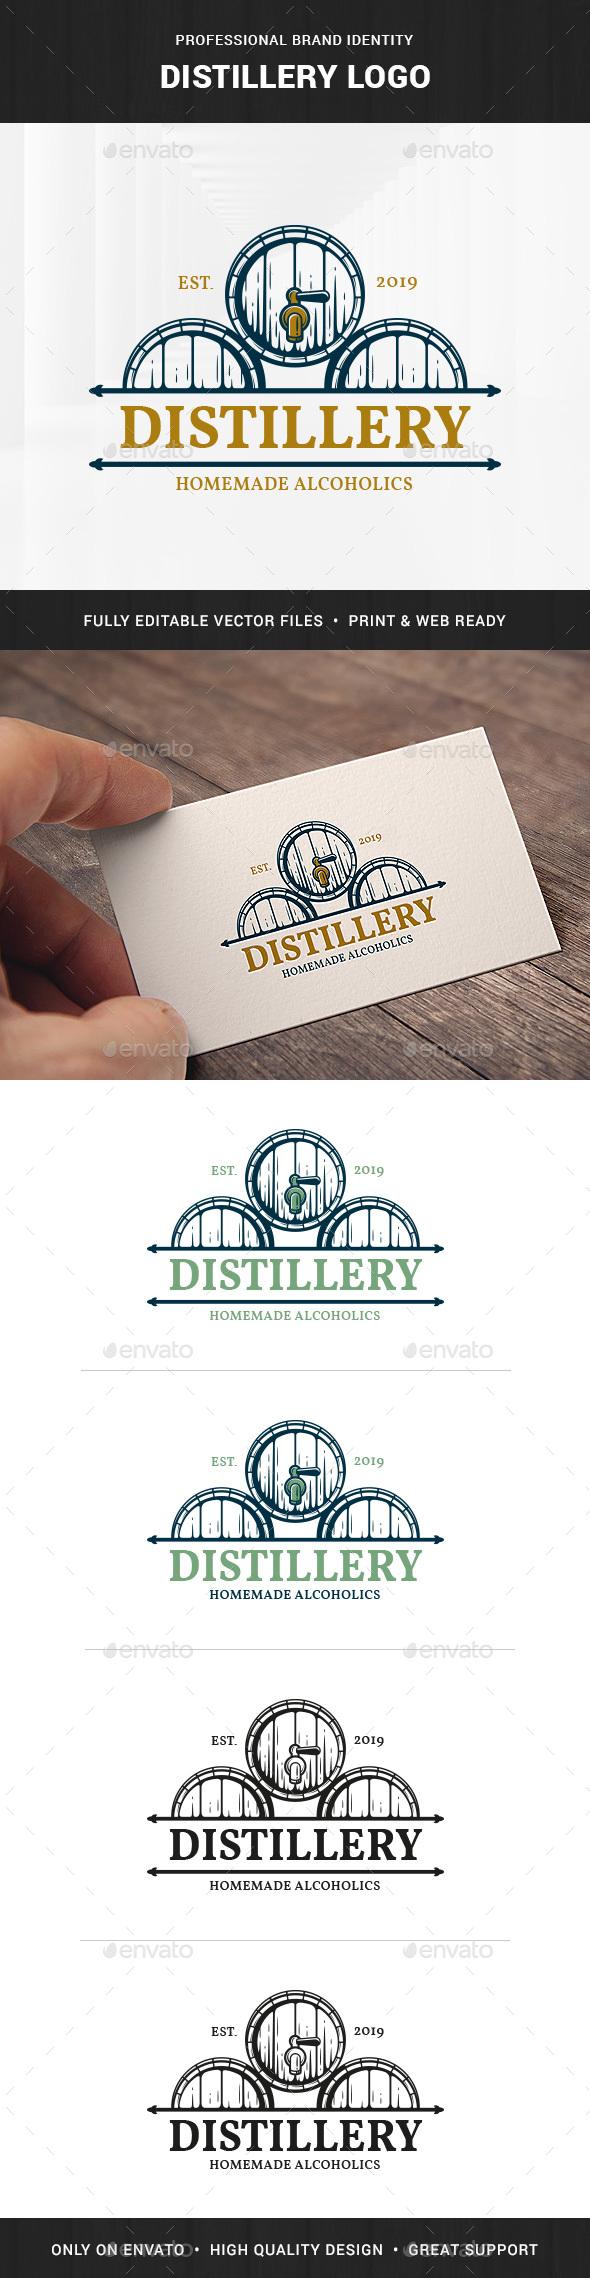 Distillery Logo Template